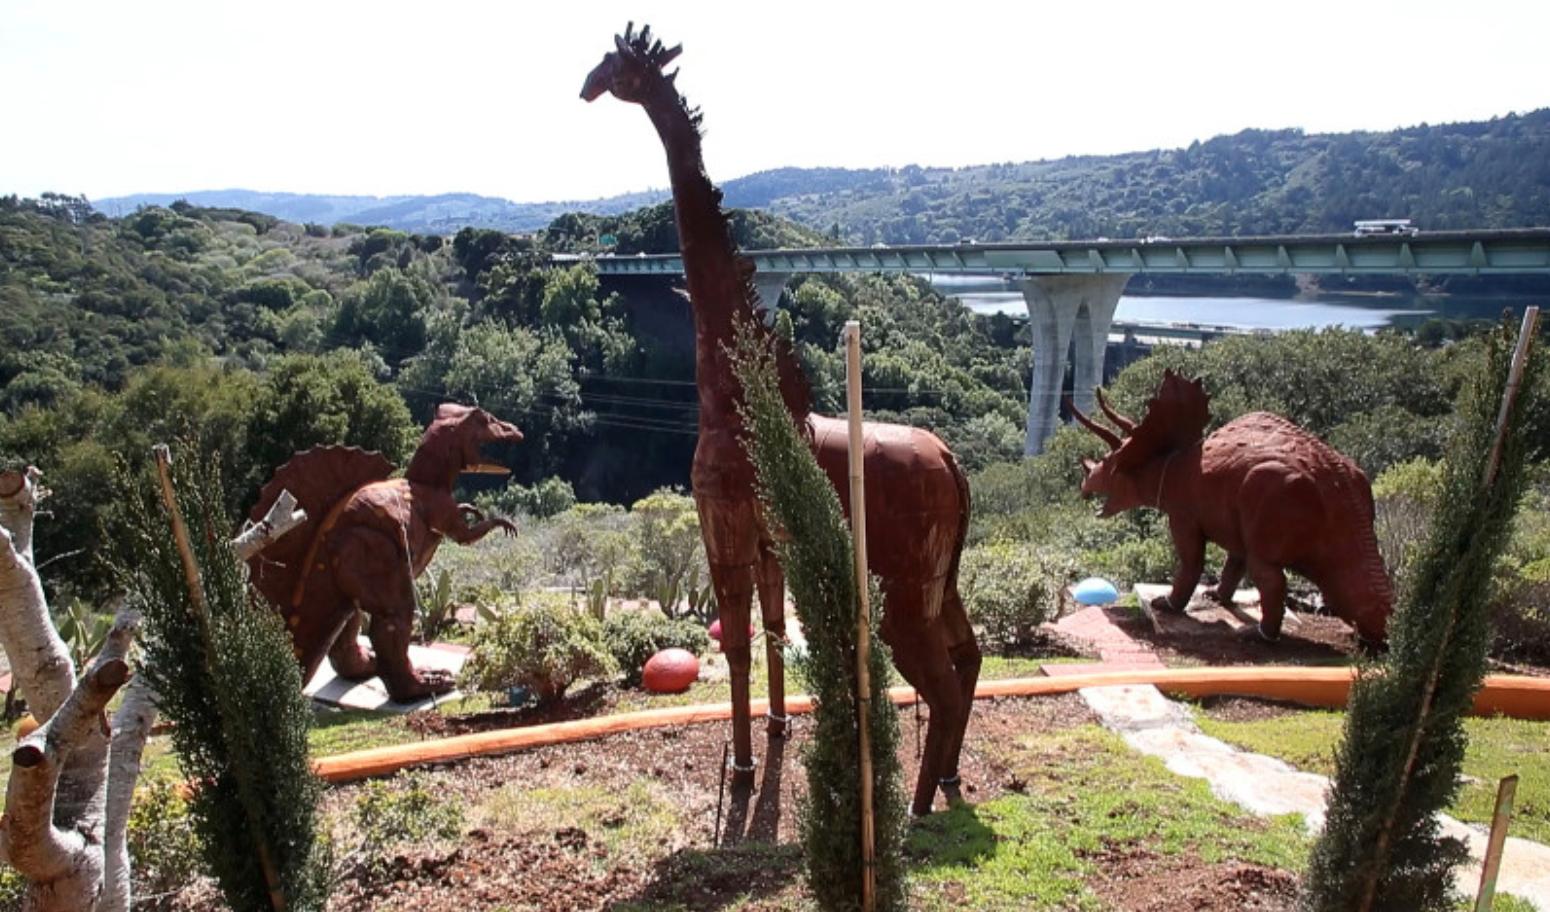 Dinosaurs 5